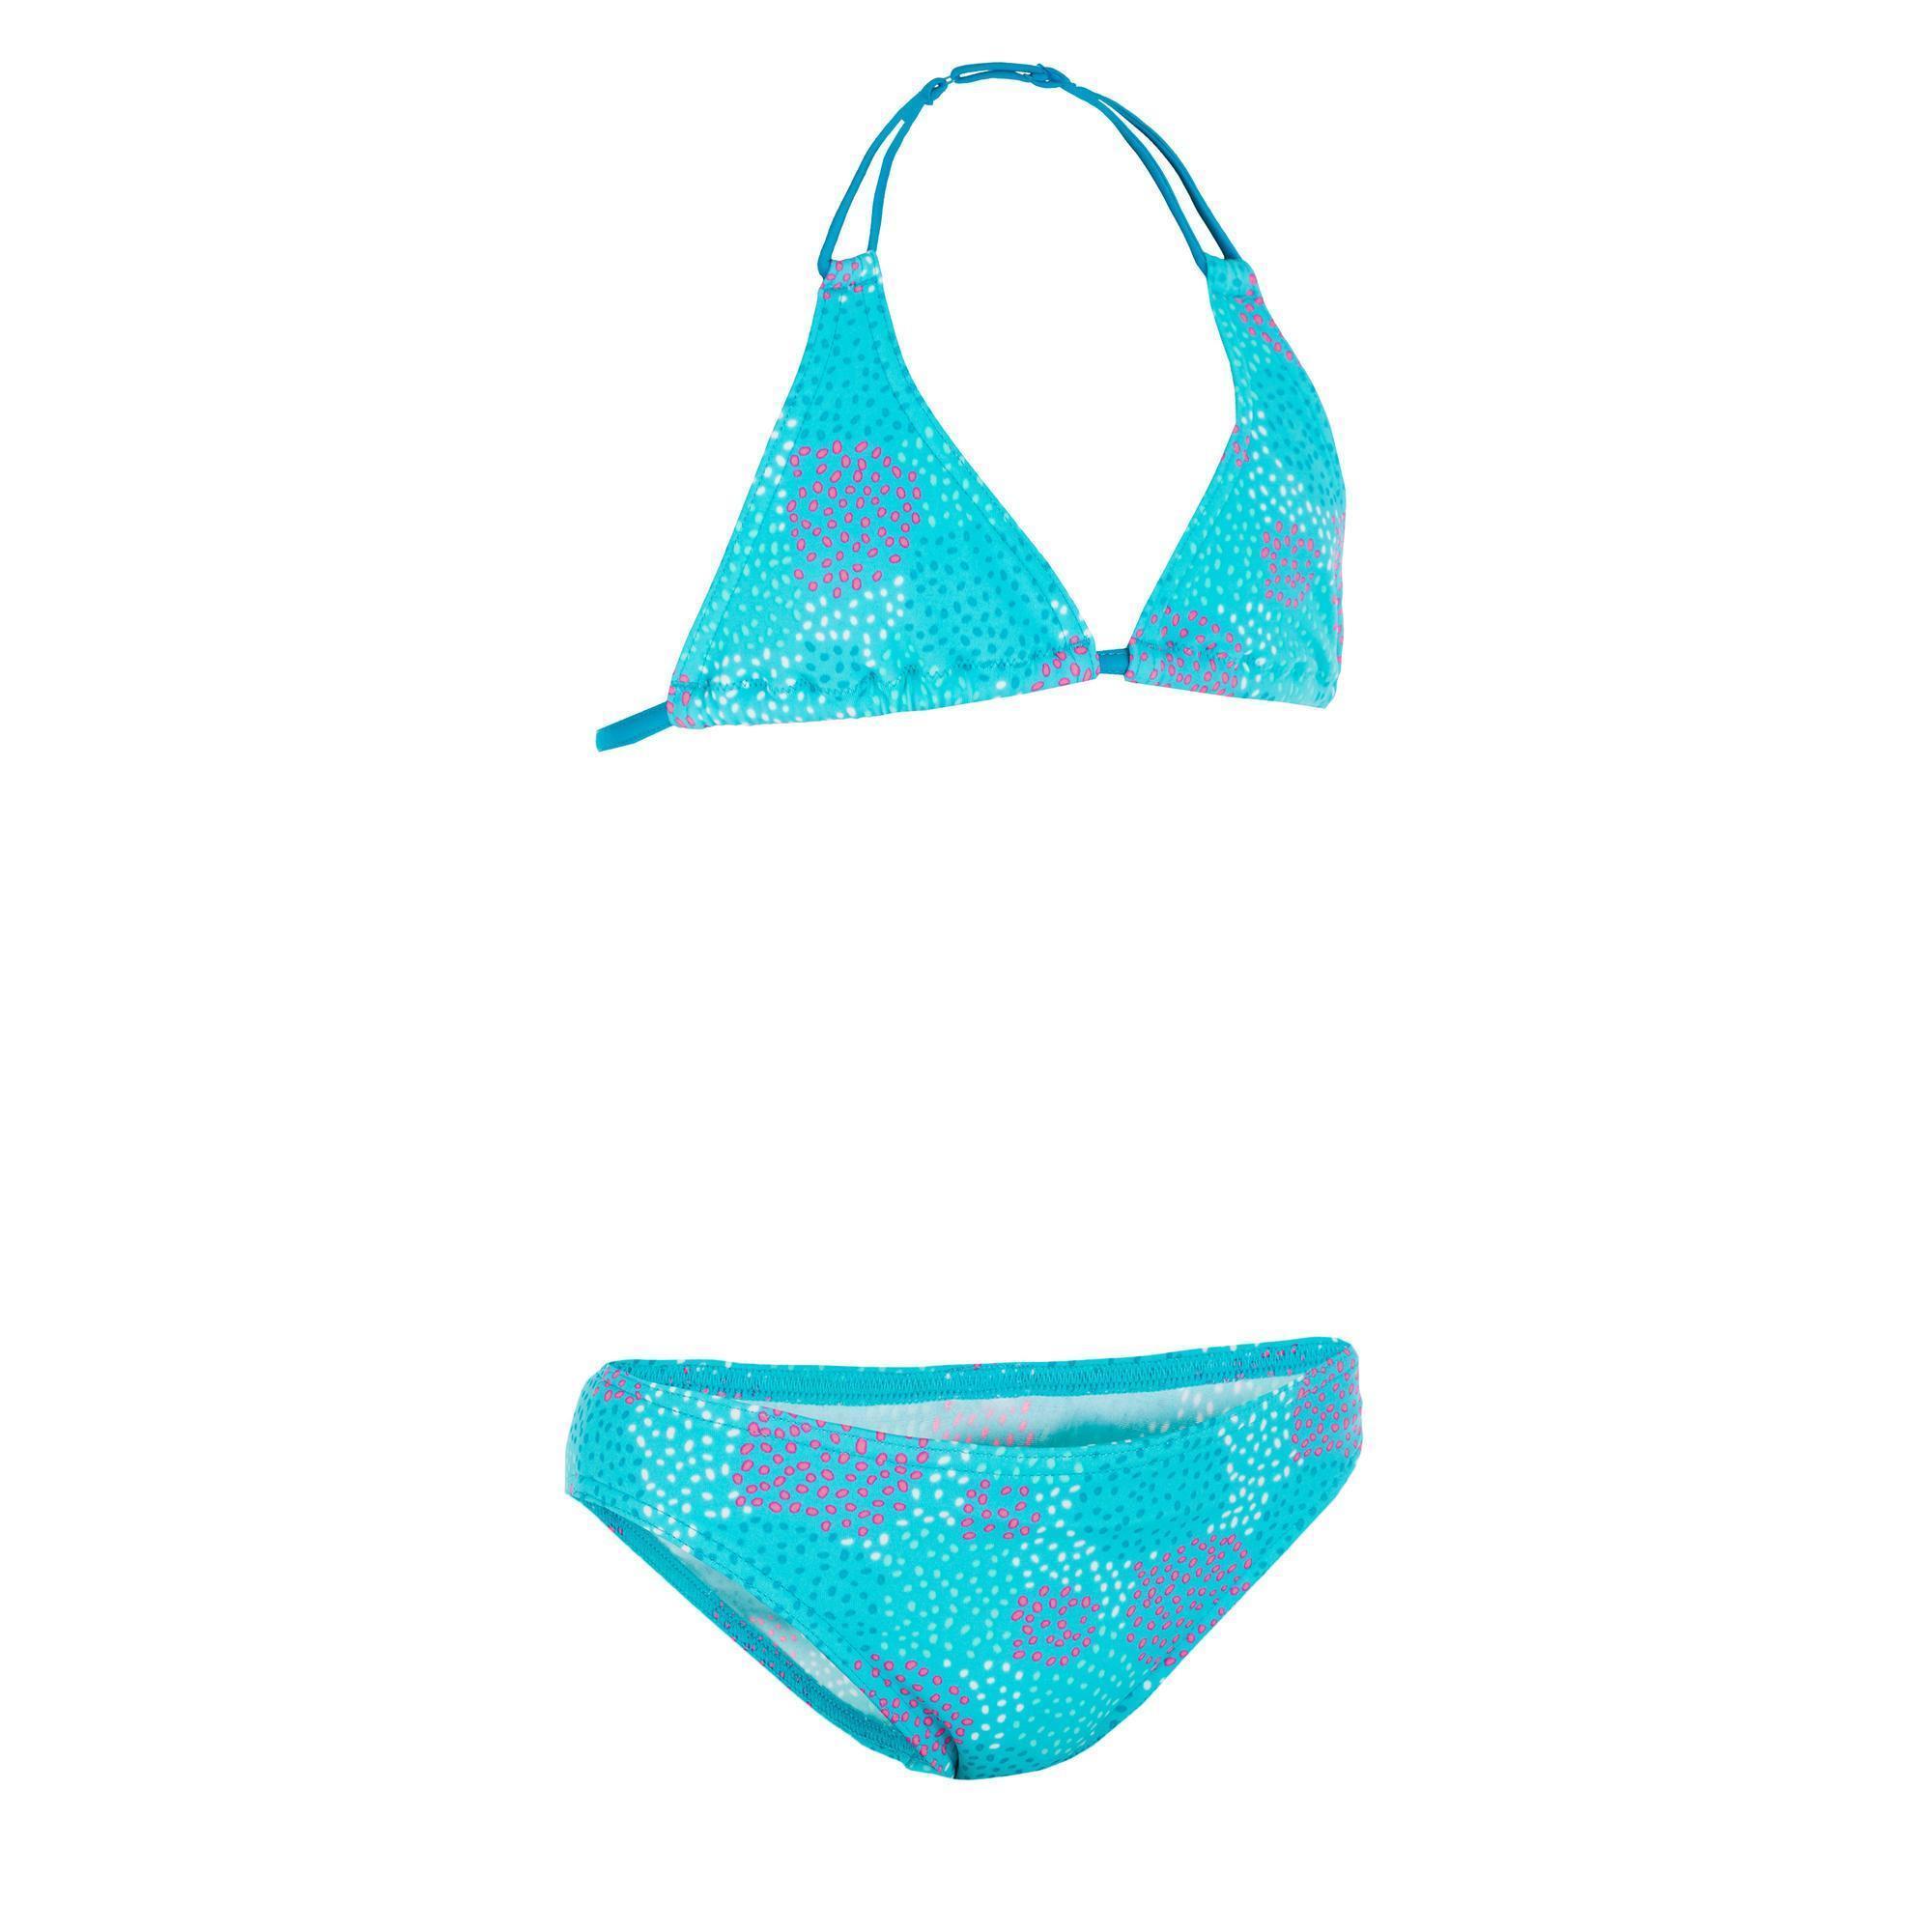 maillot de bain 2 pi ces fille triangle pompon bleu tribordvoile. Black Bedroom Furniture Sets. Home Design Ideas